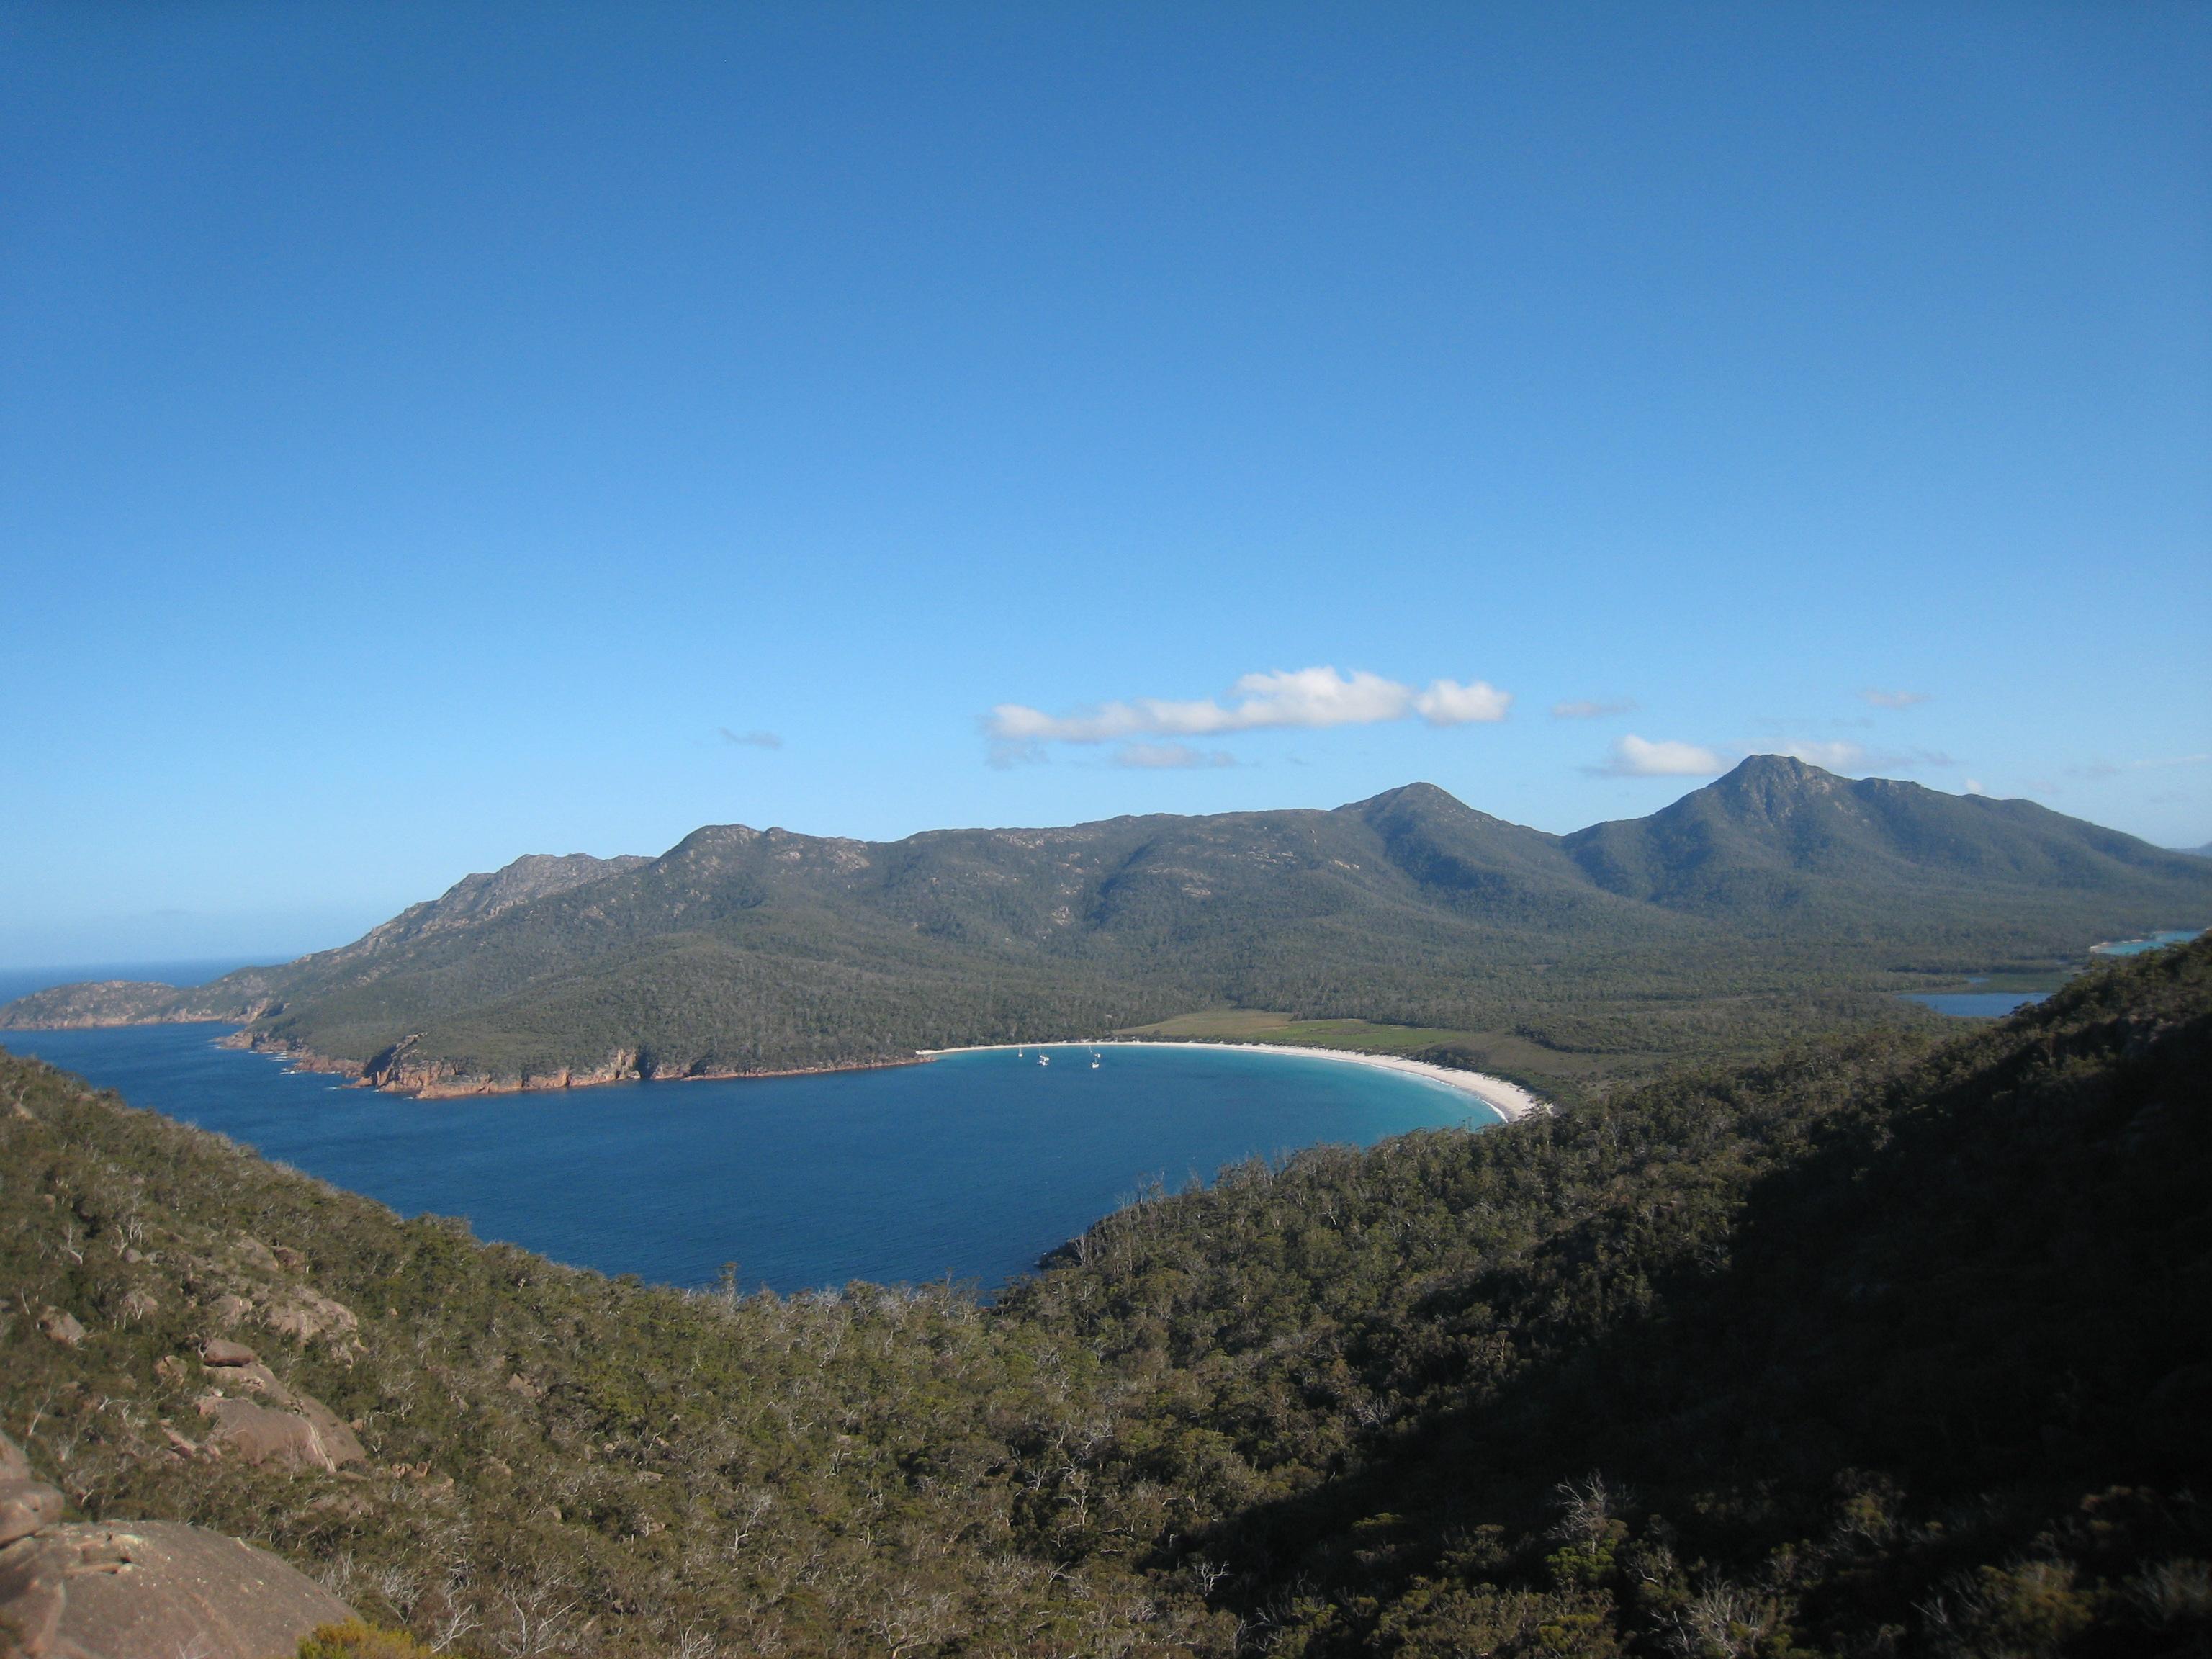 Glamorgan-Spring Bay